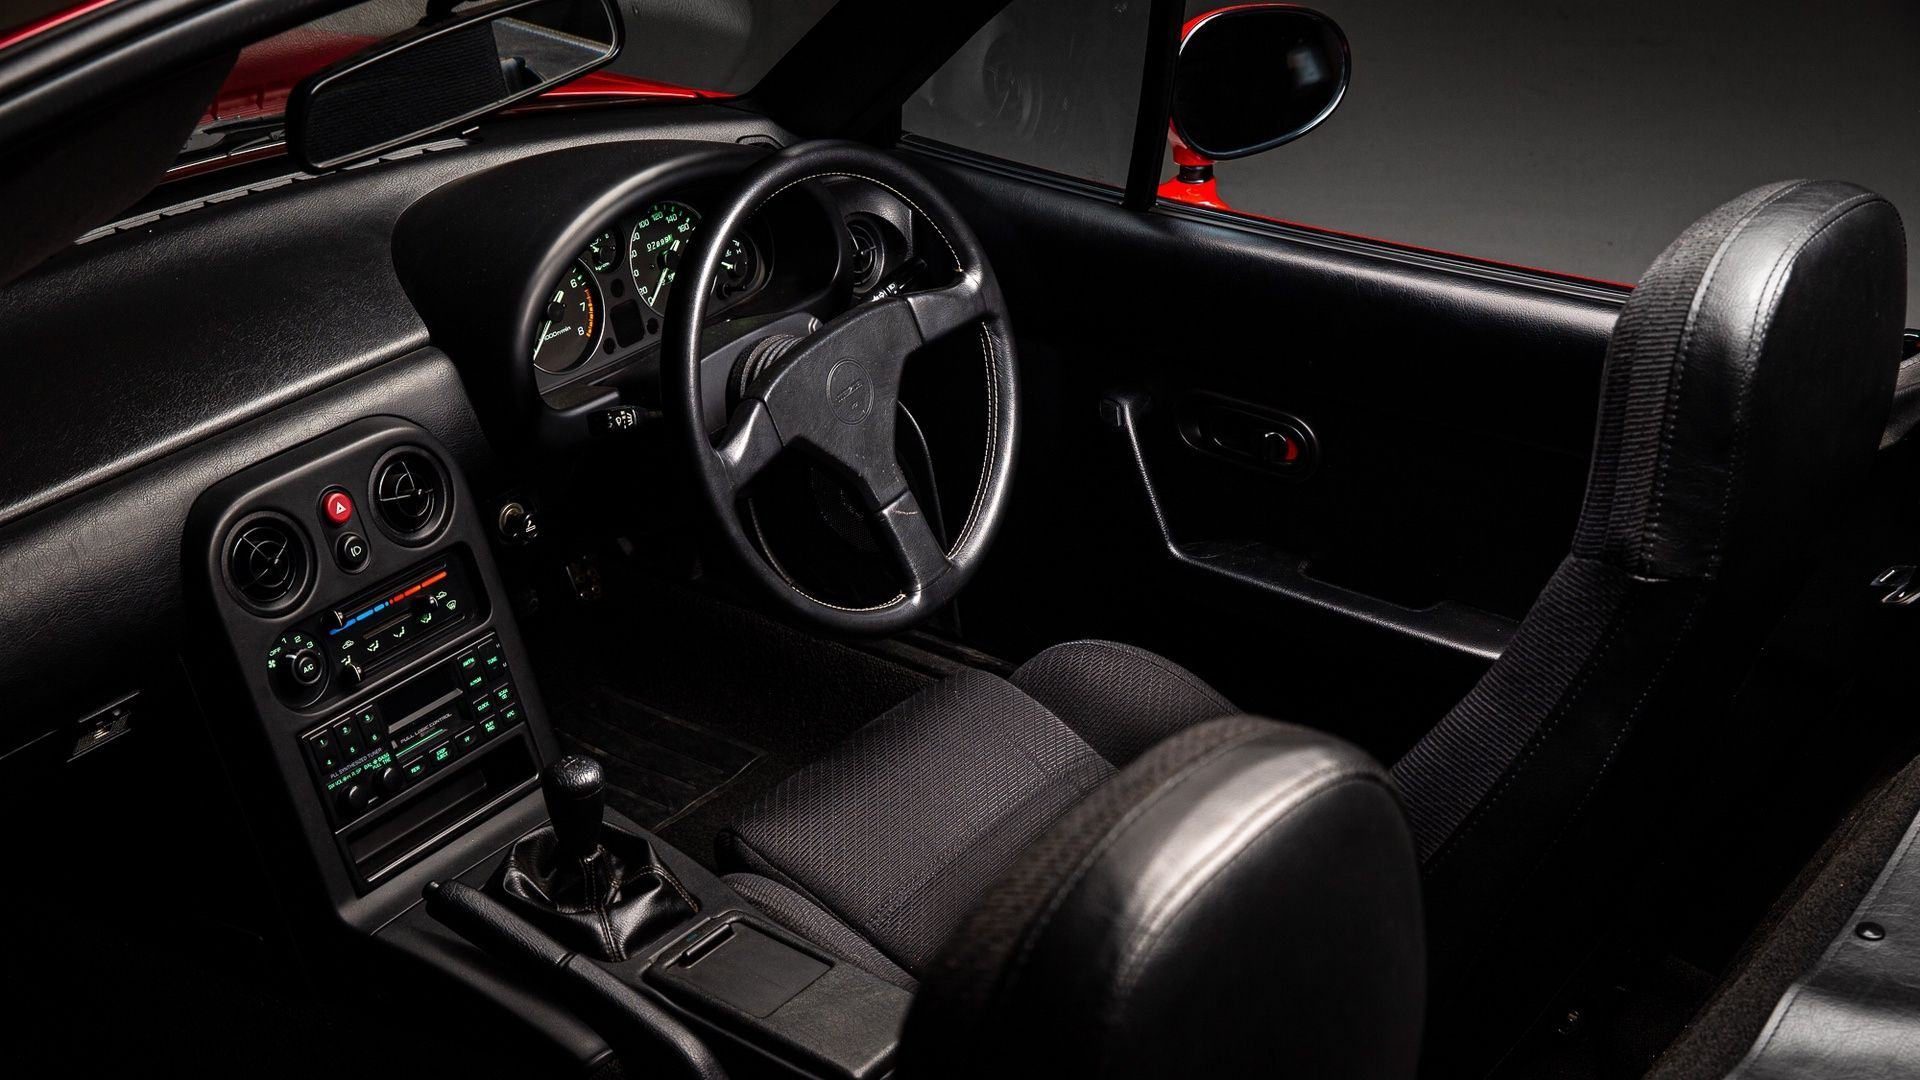 Mazda_MX-5_restoration_parts_0009